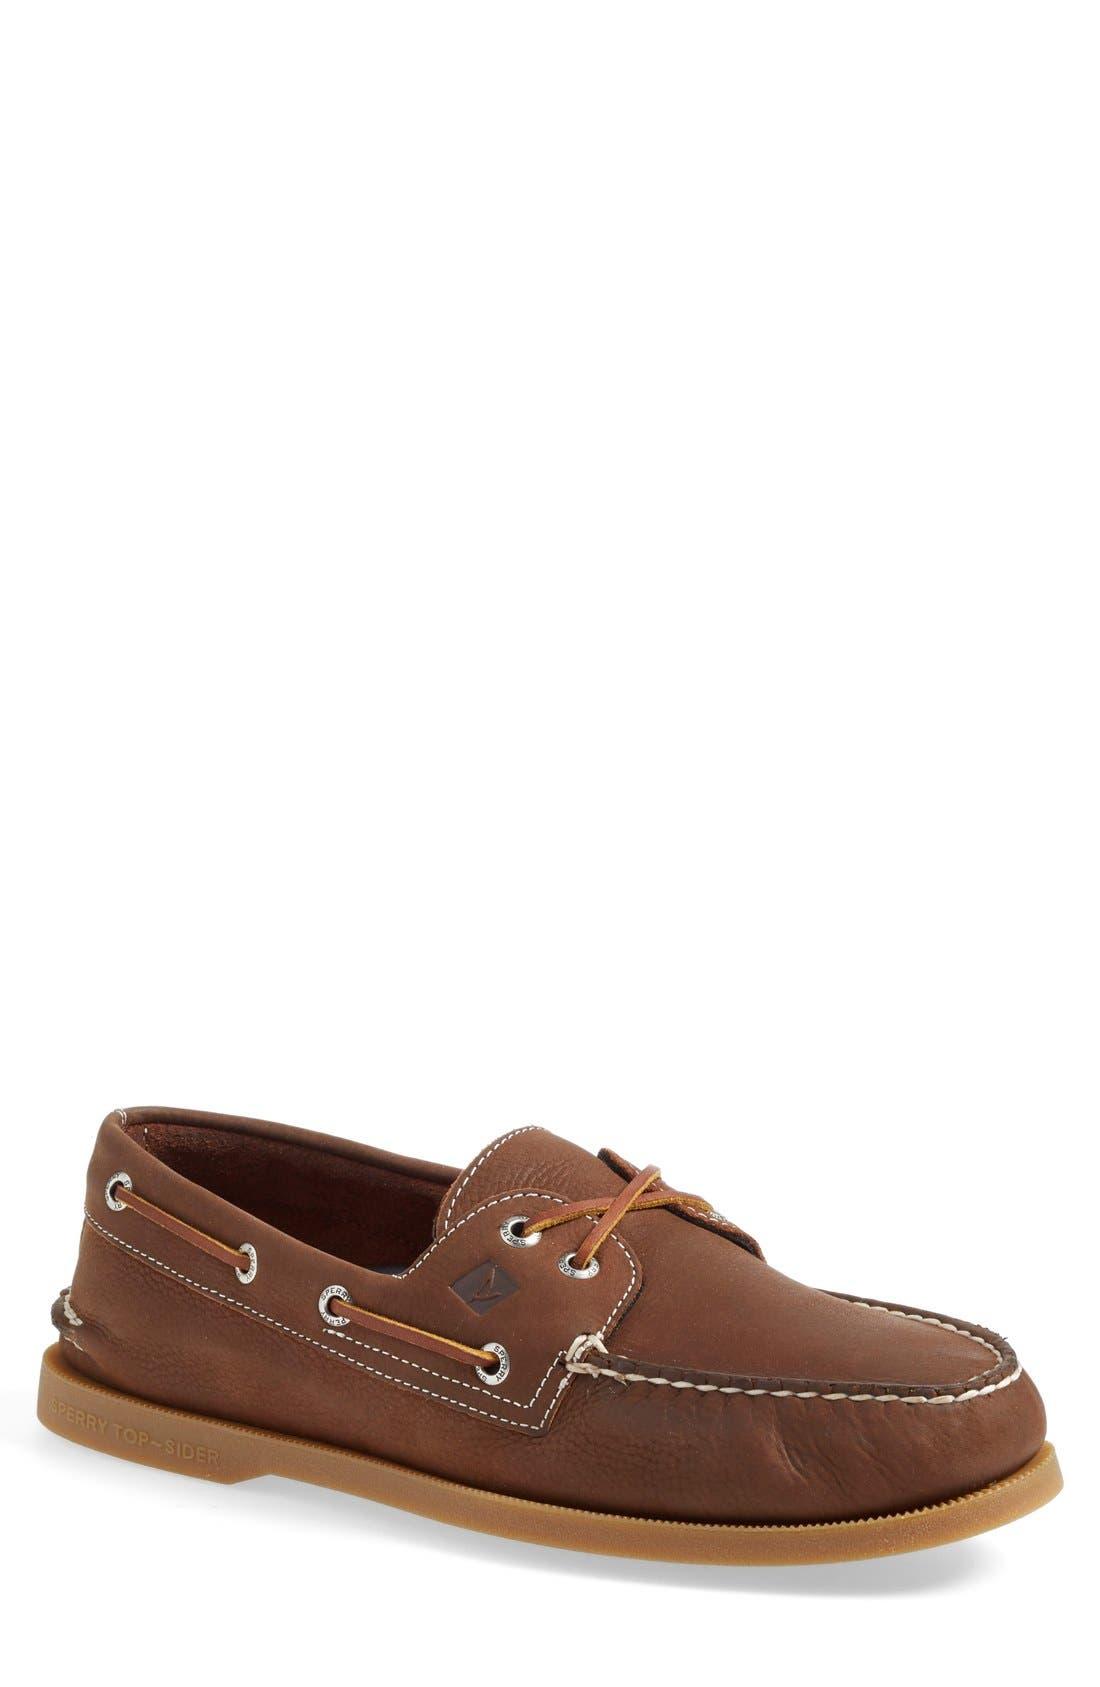 Main Image - Sperry 'Authentic Original' Boat Shoe (Men)